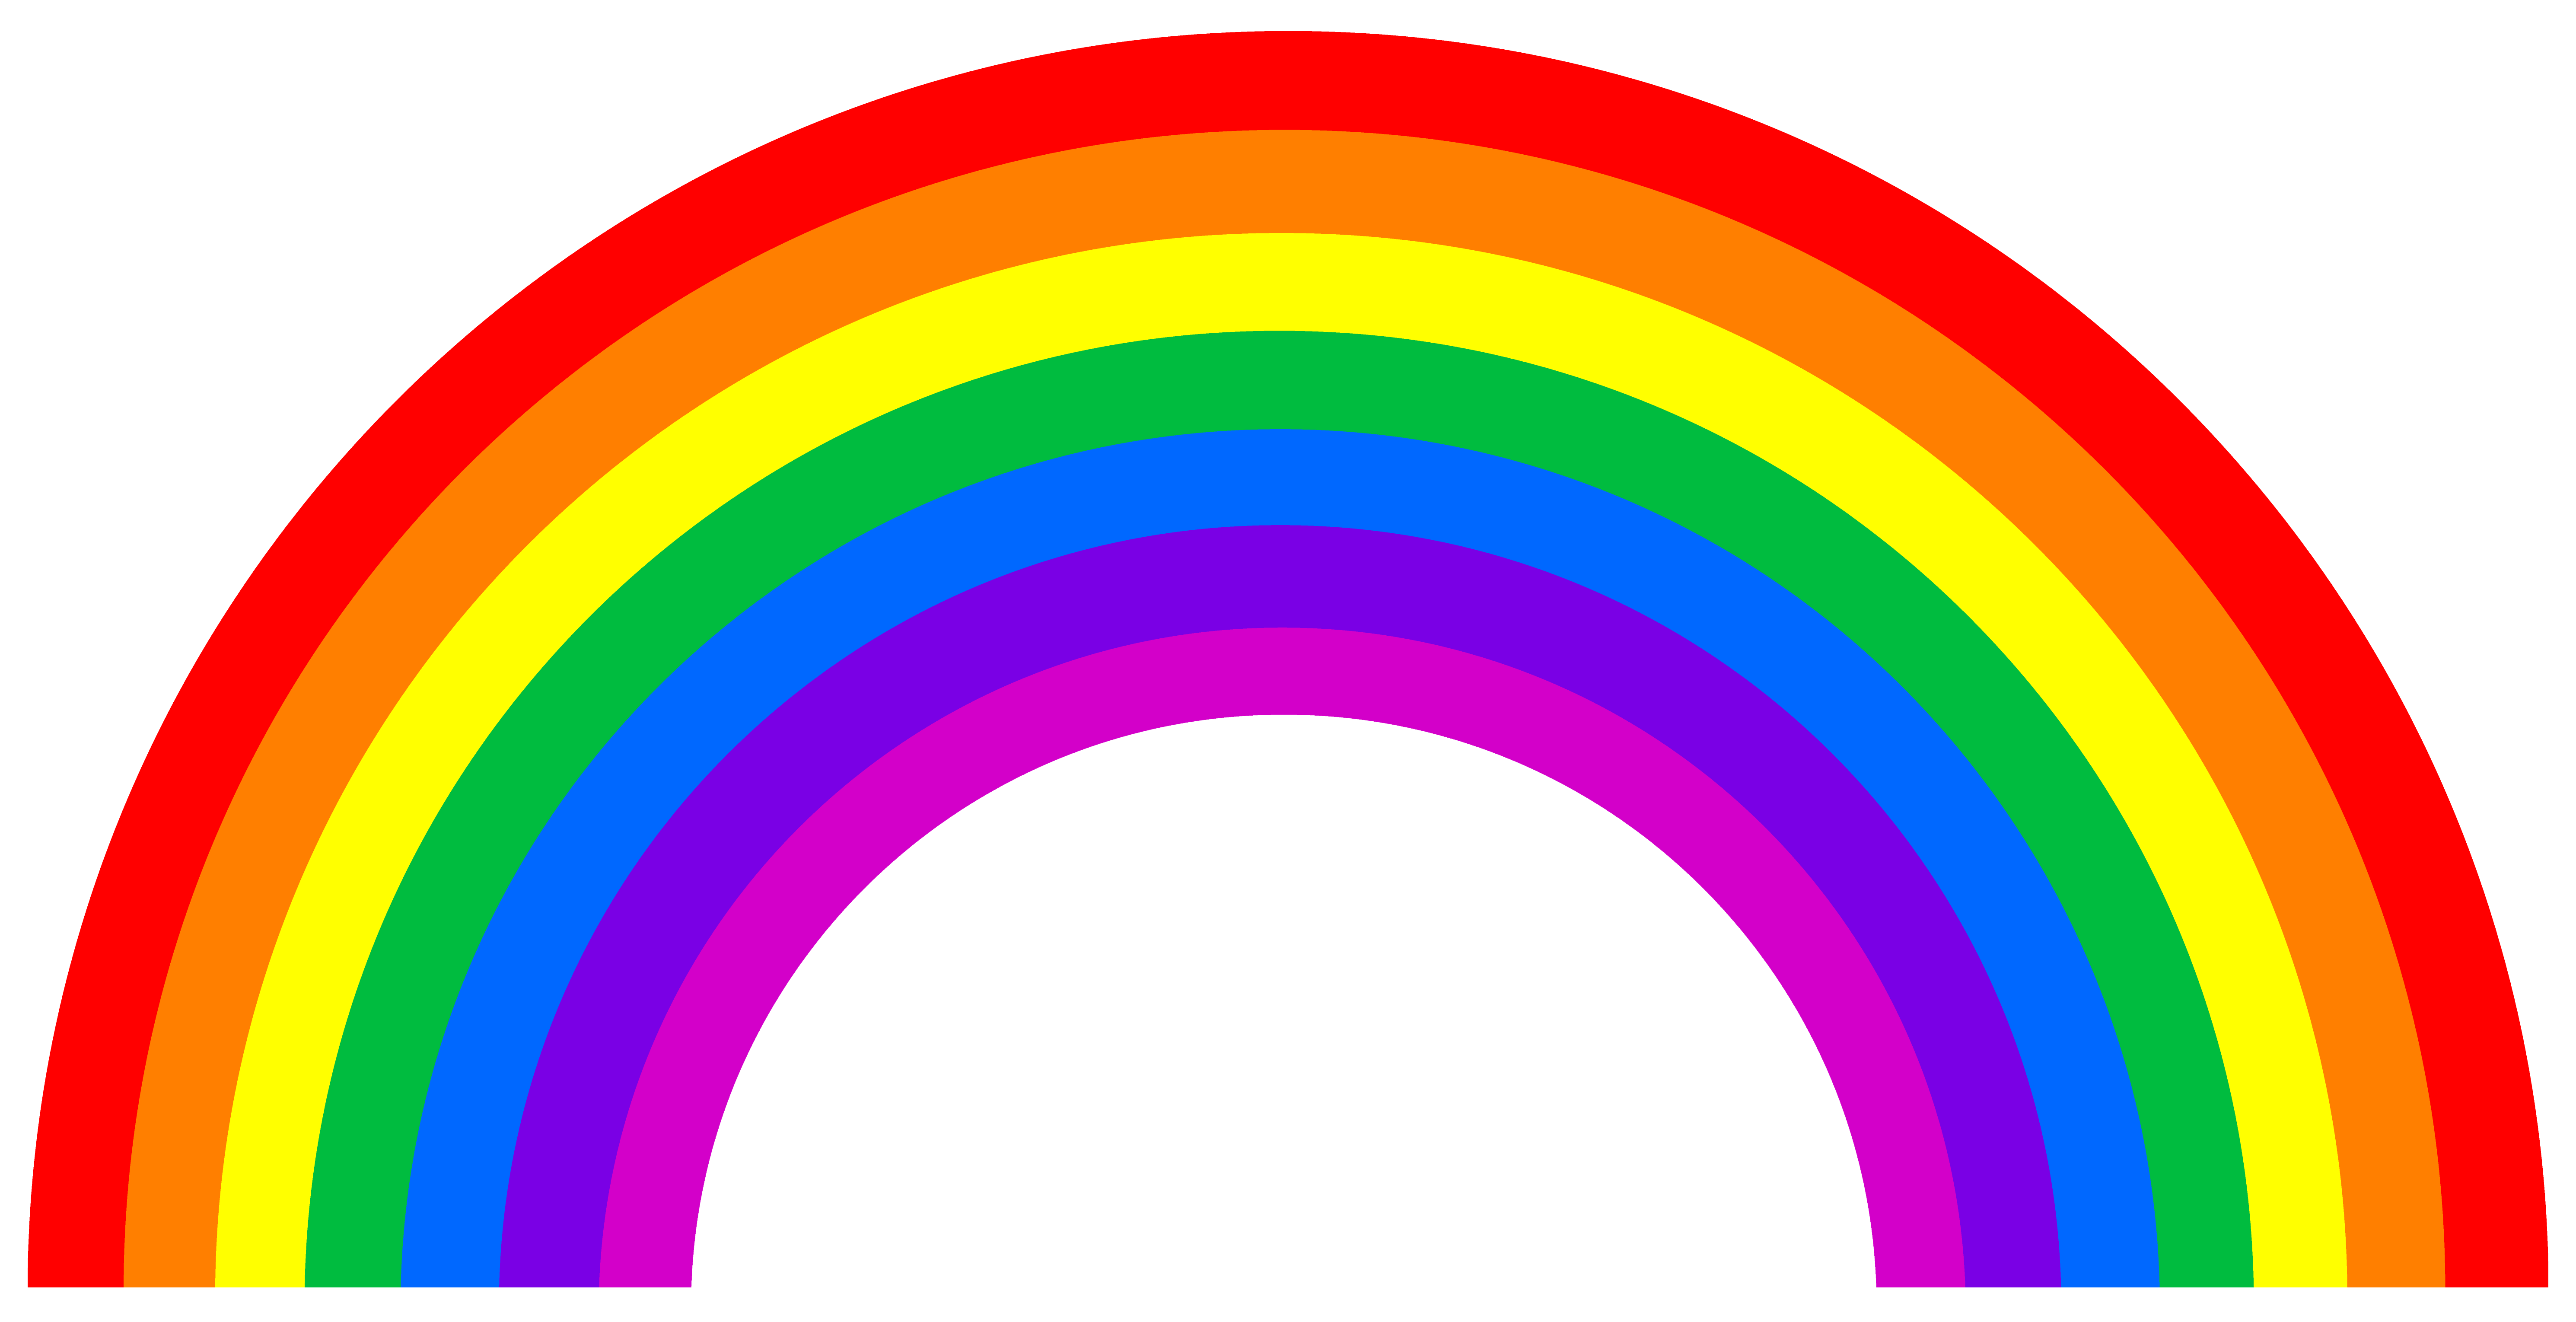 Clipart Of Rainbows-Clipart Of Rainbows-17